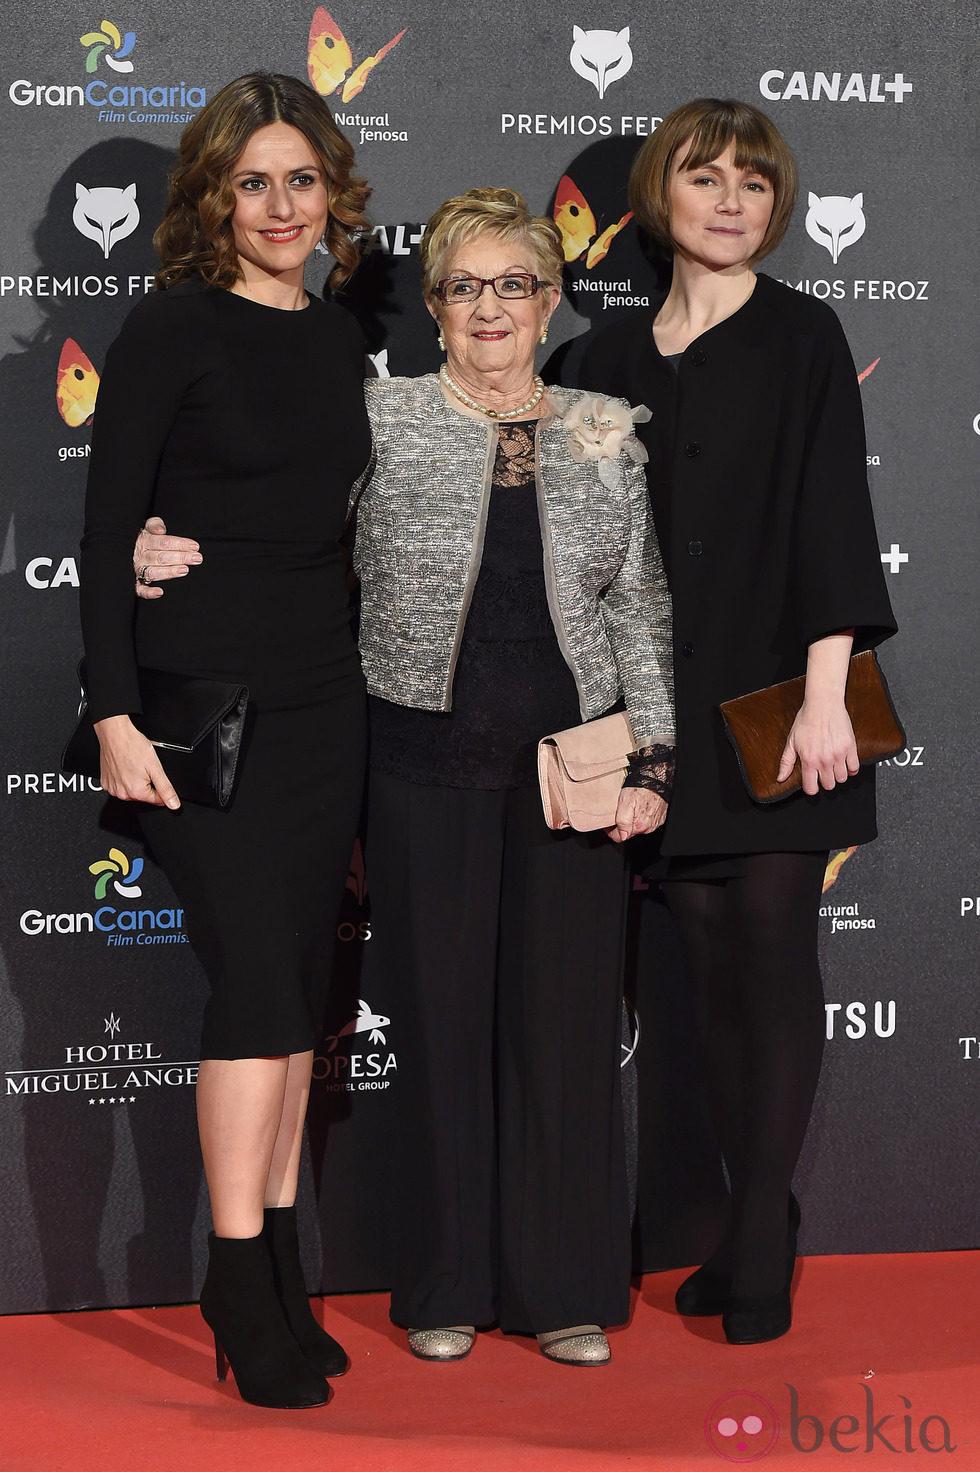 Itziar Aizpuru en la alfombra roja de los Premios Feroz 2015